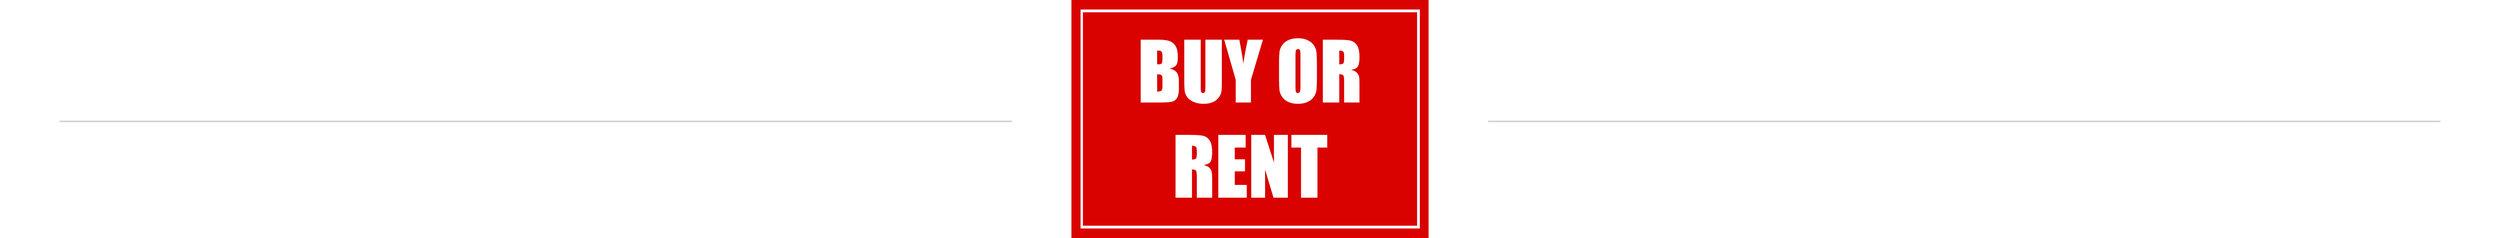 Buy or Rent Sign 2.jpg